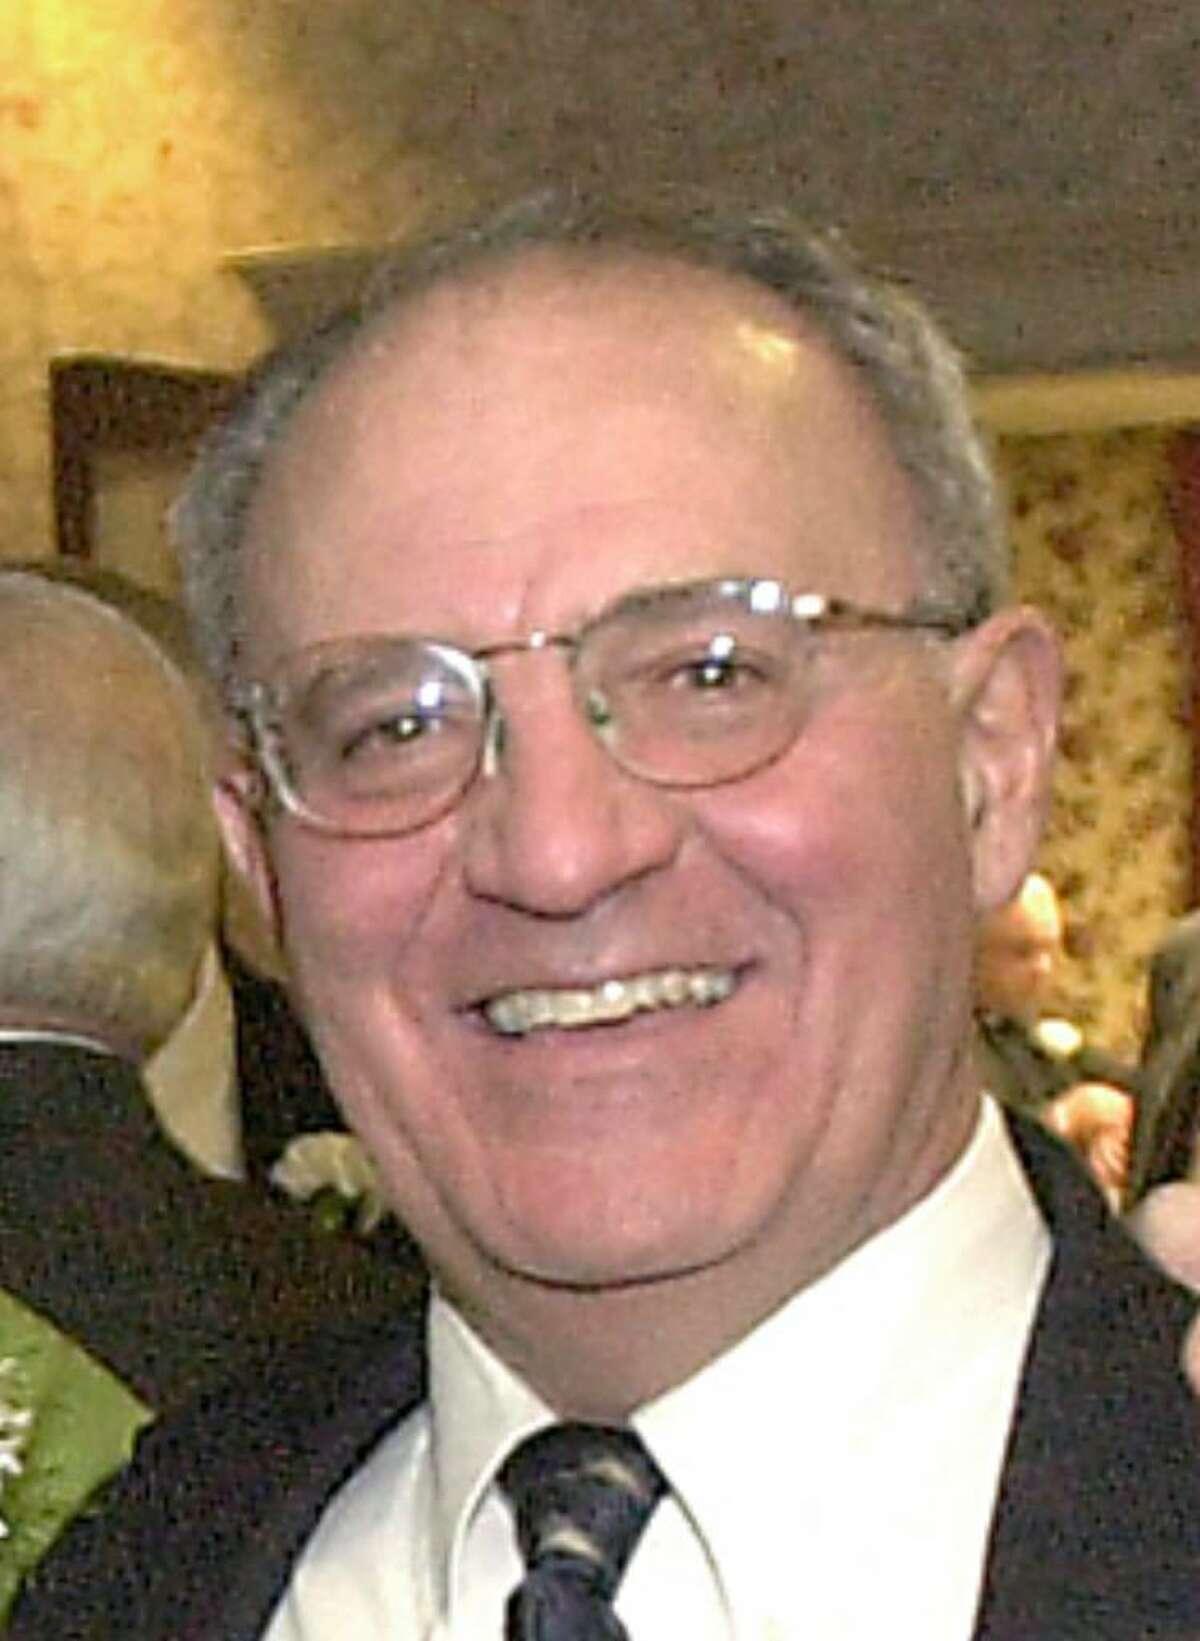 Carmine Limone as seen in a file photo Dec. 6th, 2004.